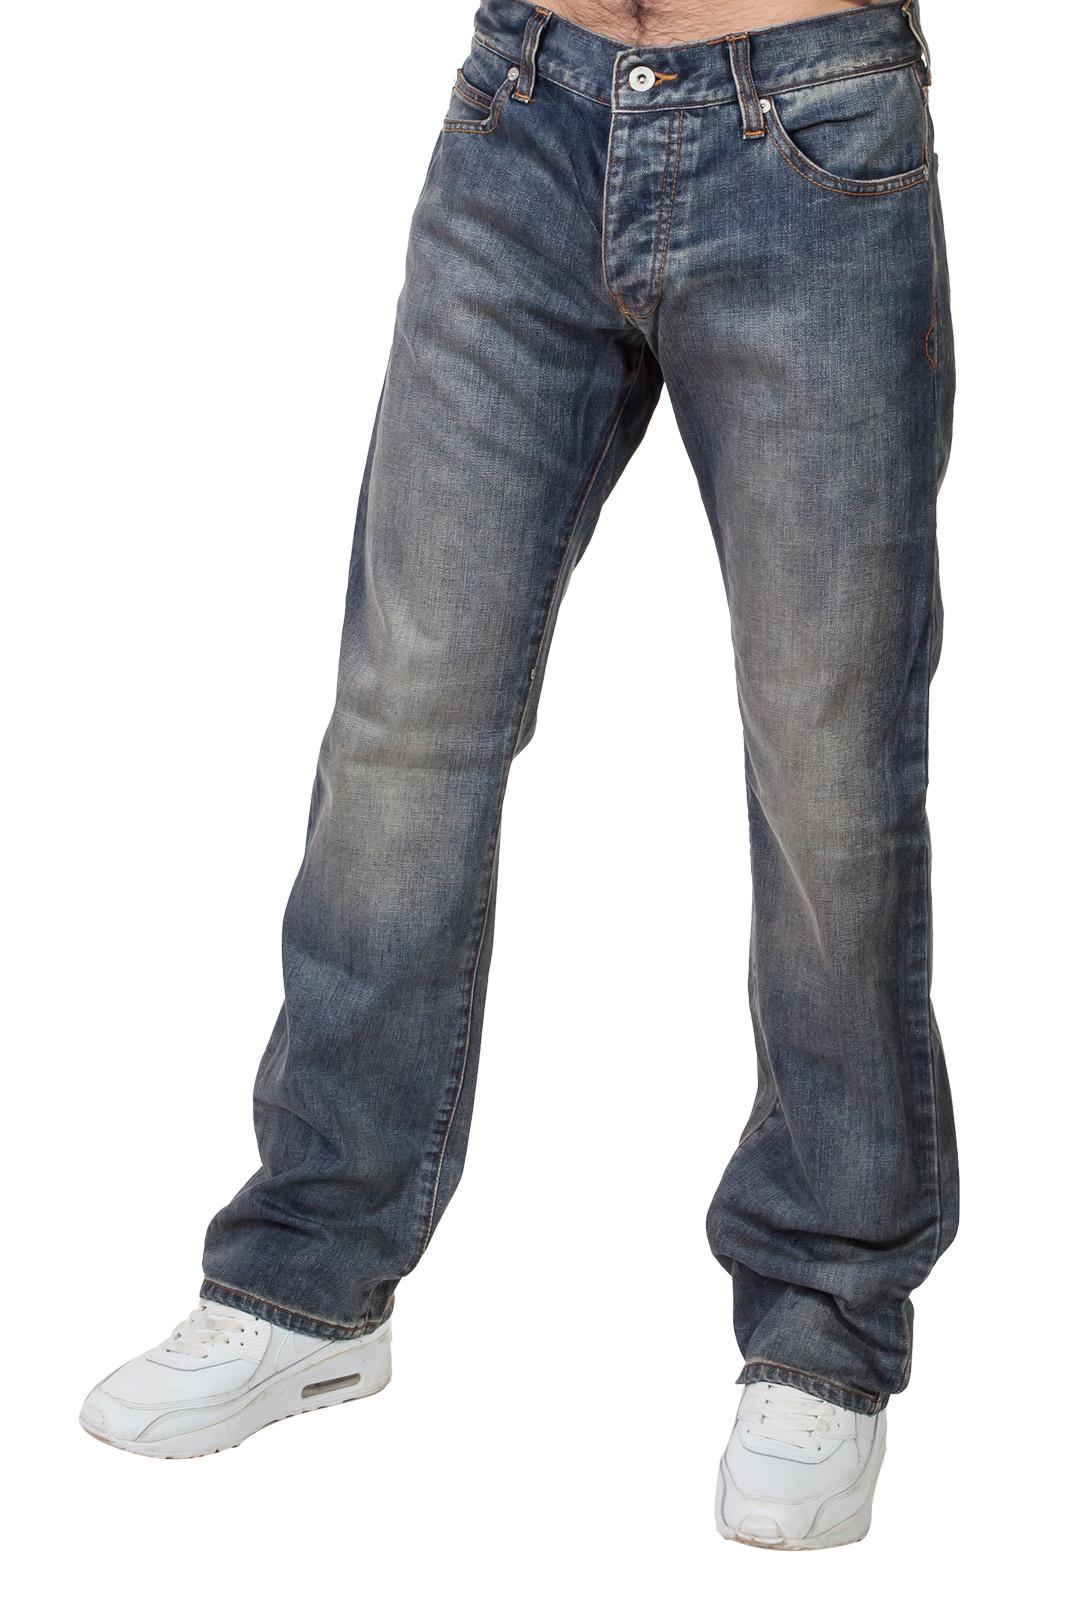 Крутые джинсы трубы для парней